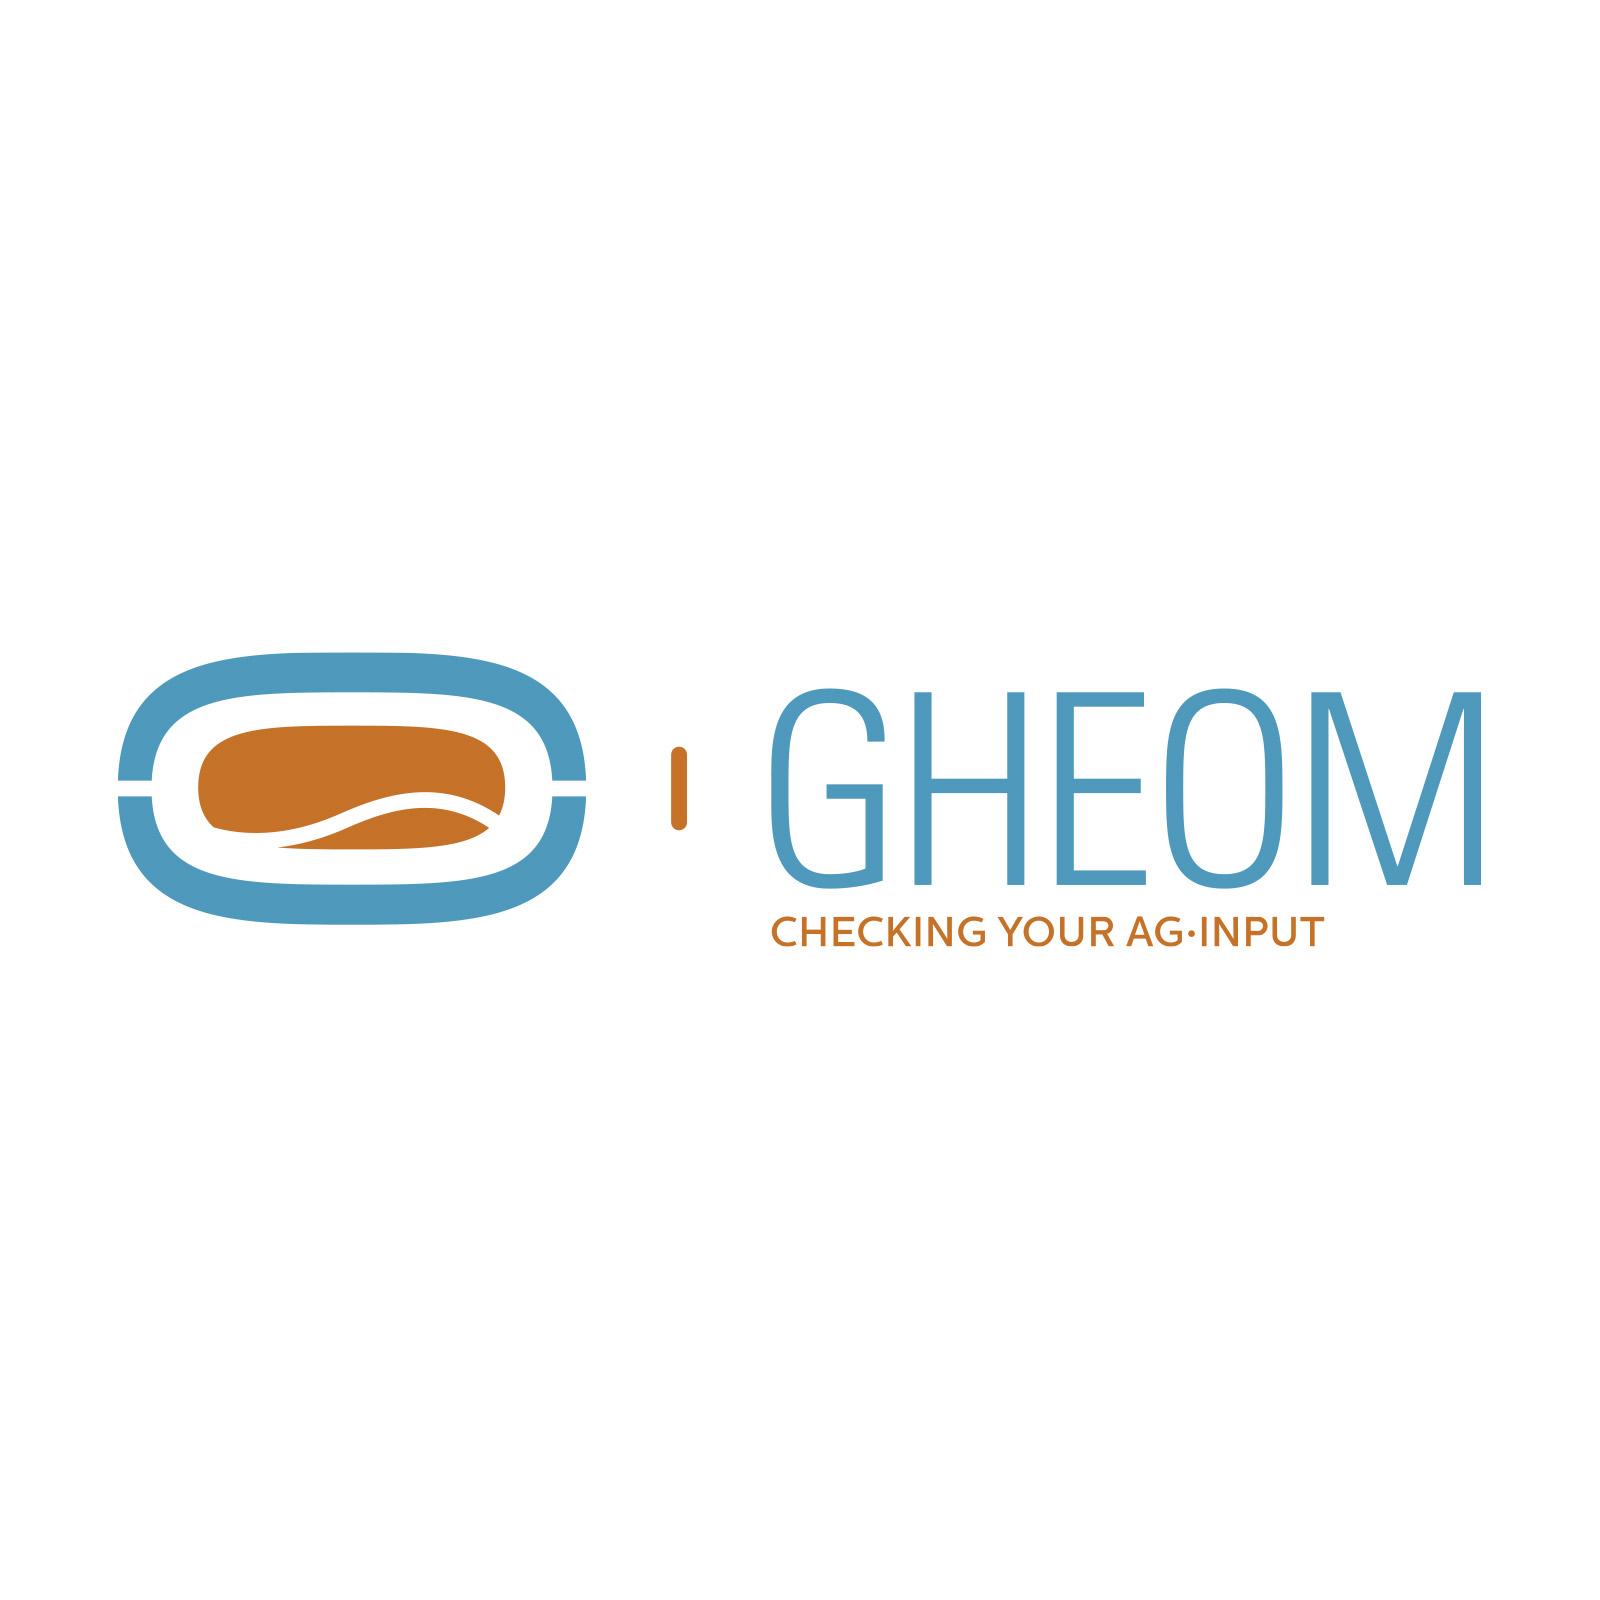 Gheom2.jpg